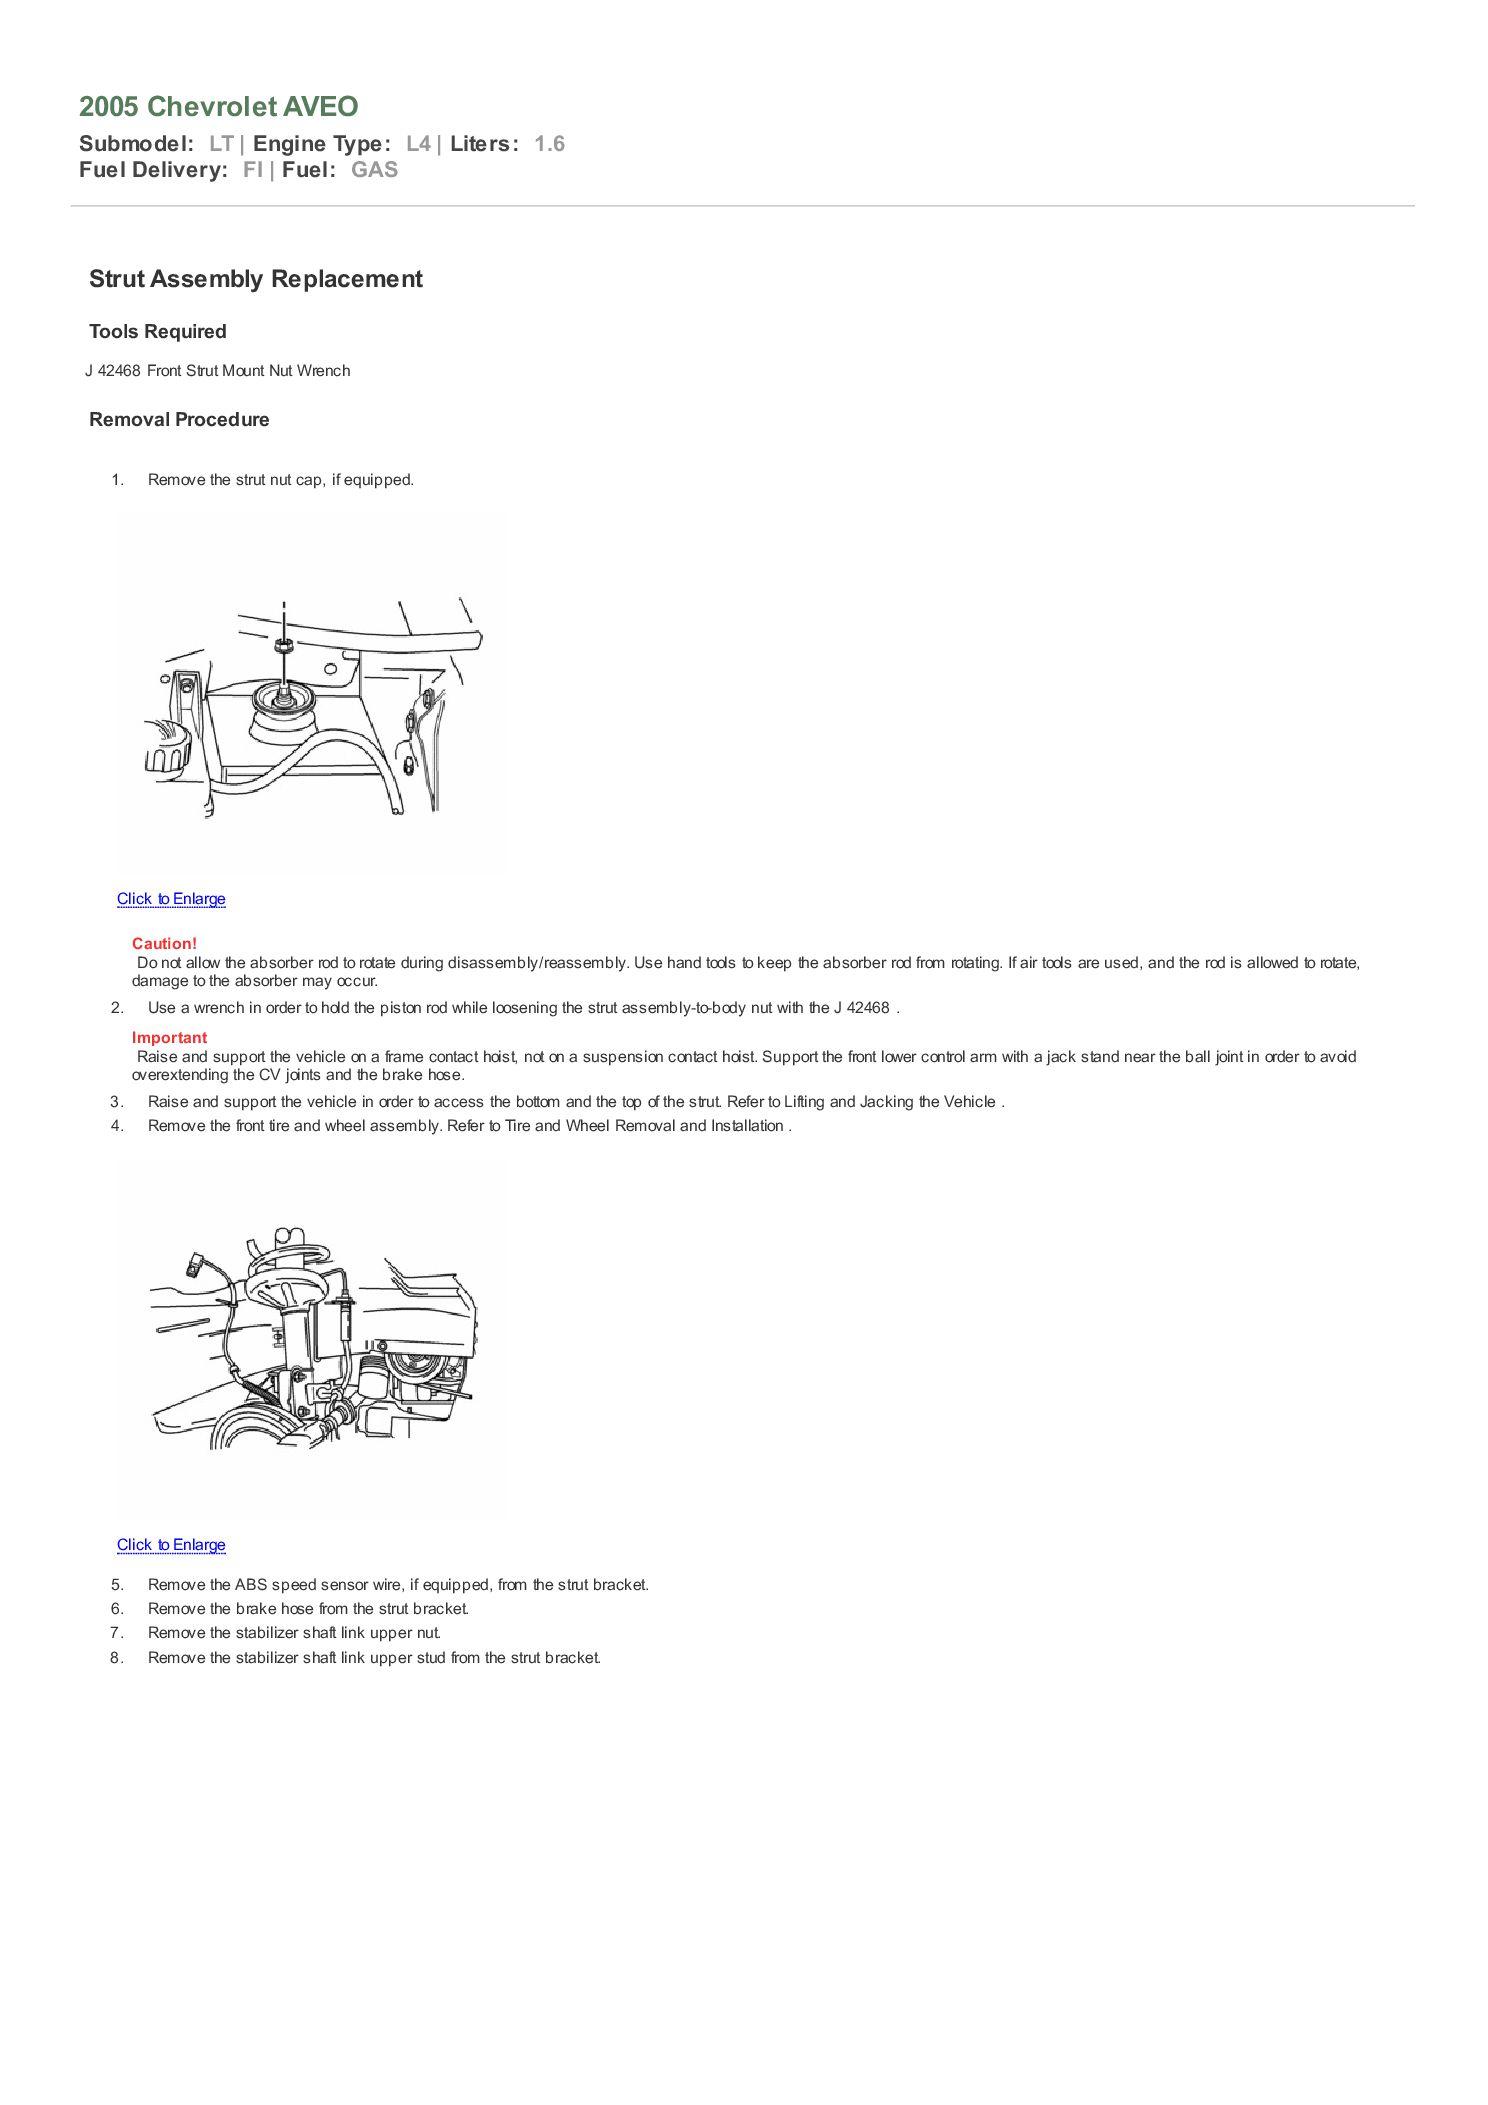 Chevy Aveo Strut Diagram Wiring Diagrams Data Base Radiator Replacing My Front Struts Rh Aveoforum Com On 2011 Recall List For Attachment